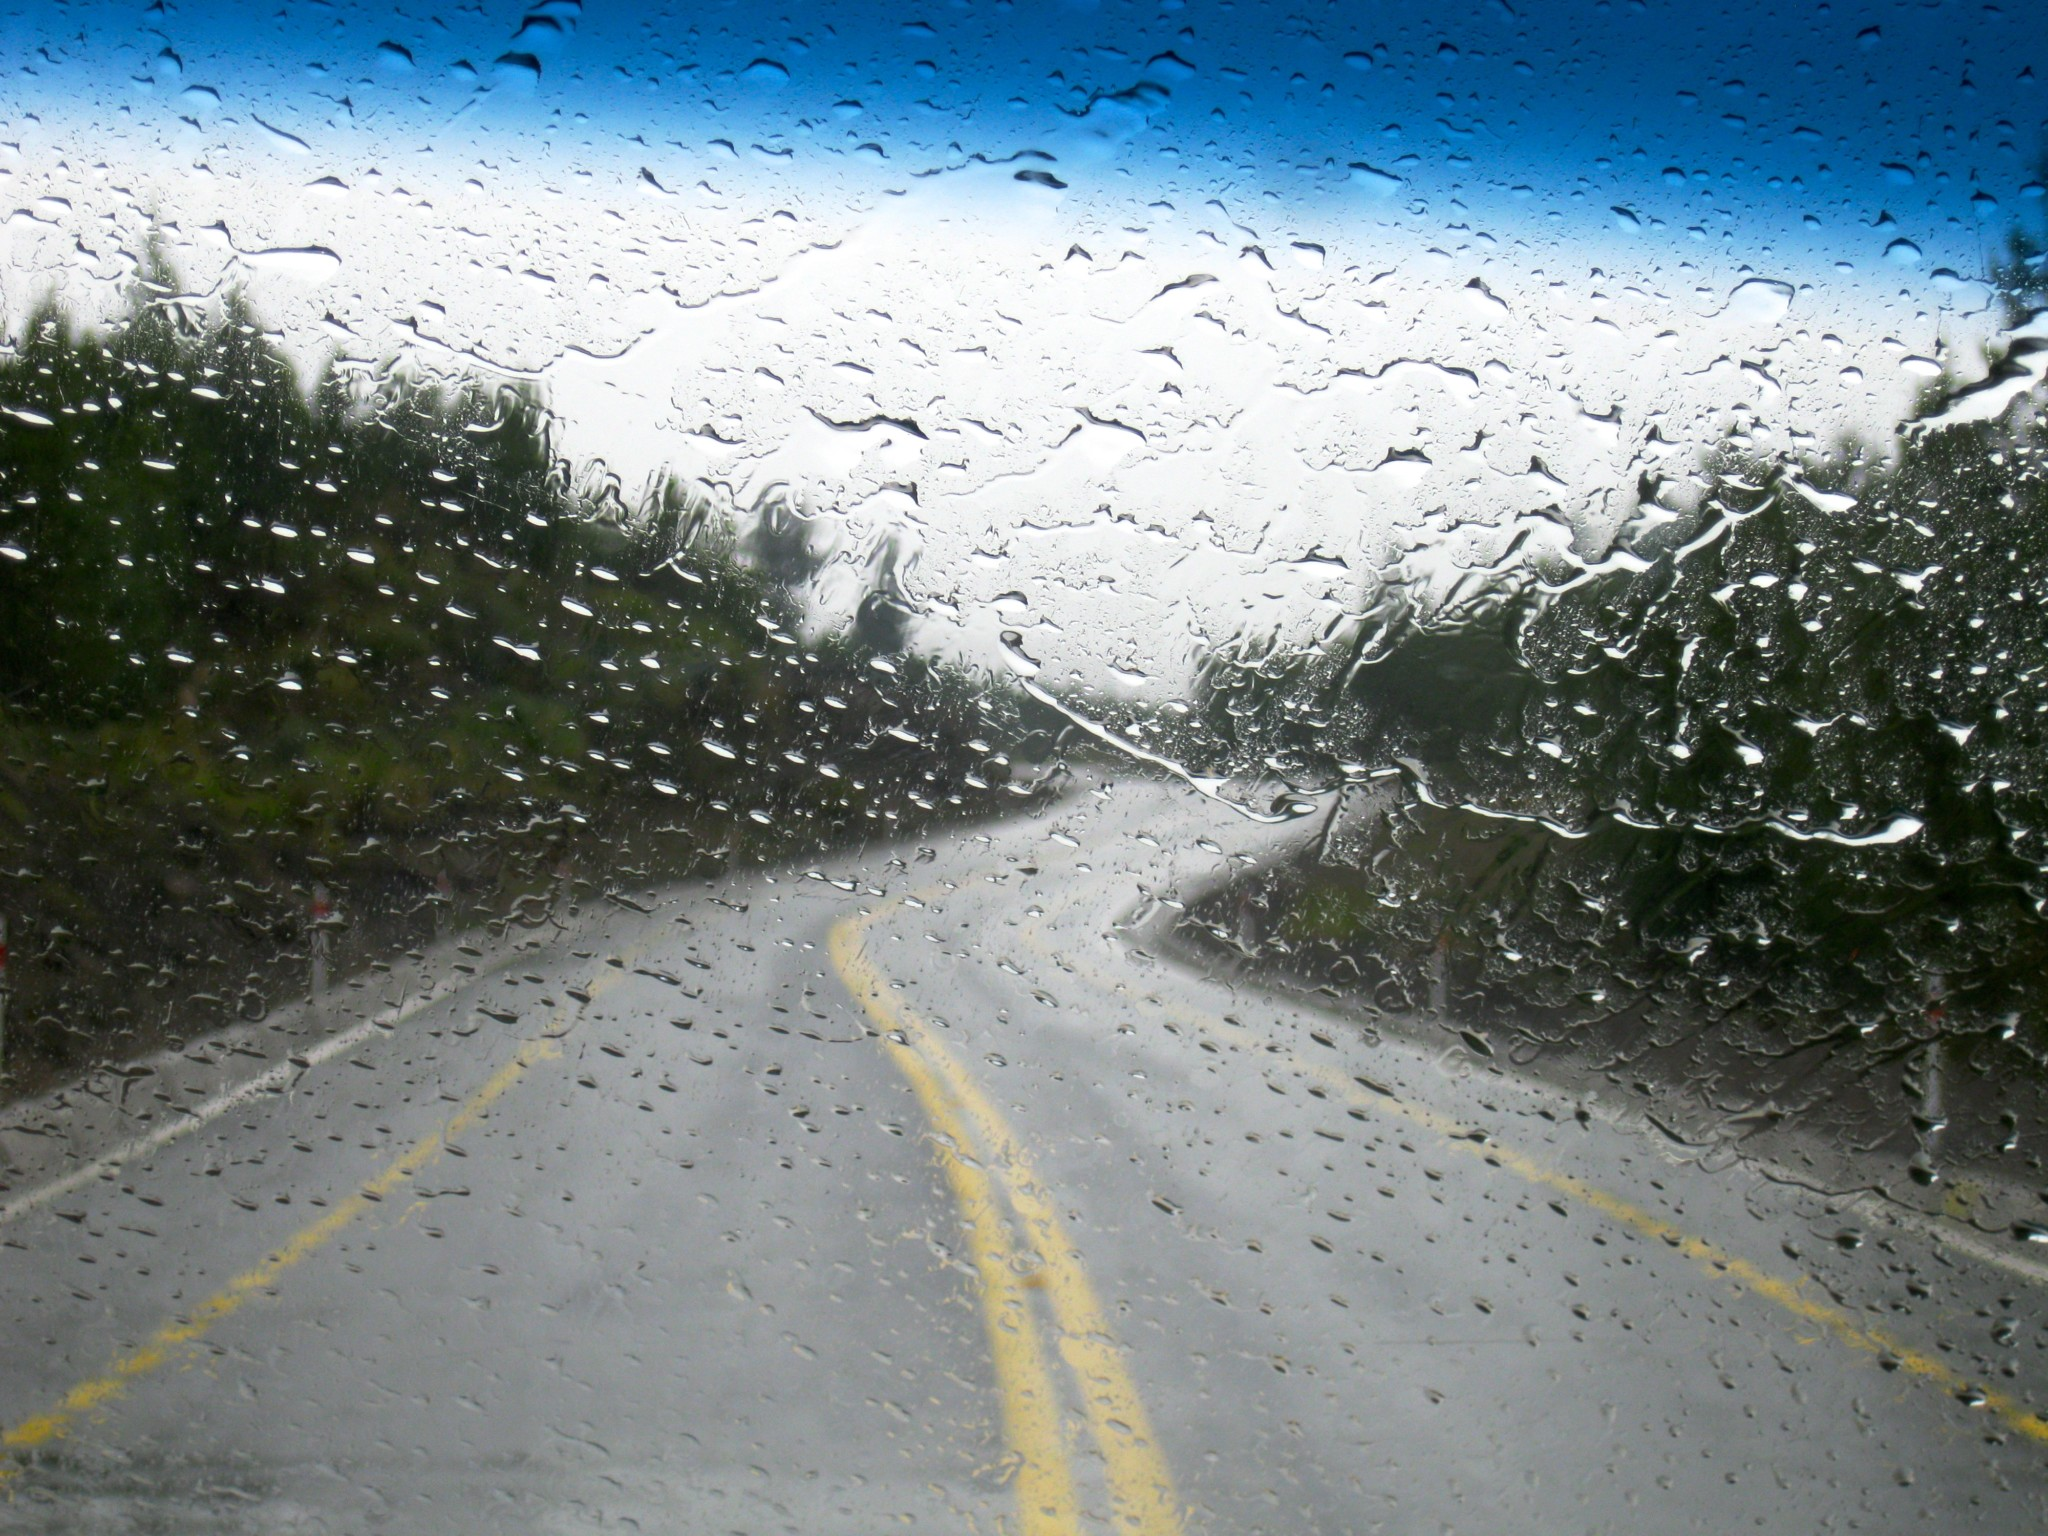 можете найти дождь на дороге картинка для большого стола